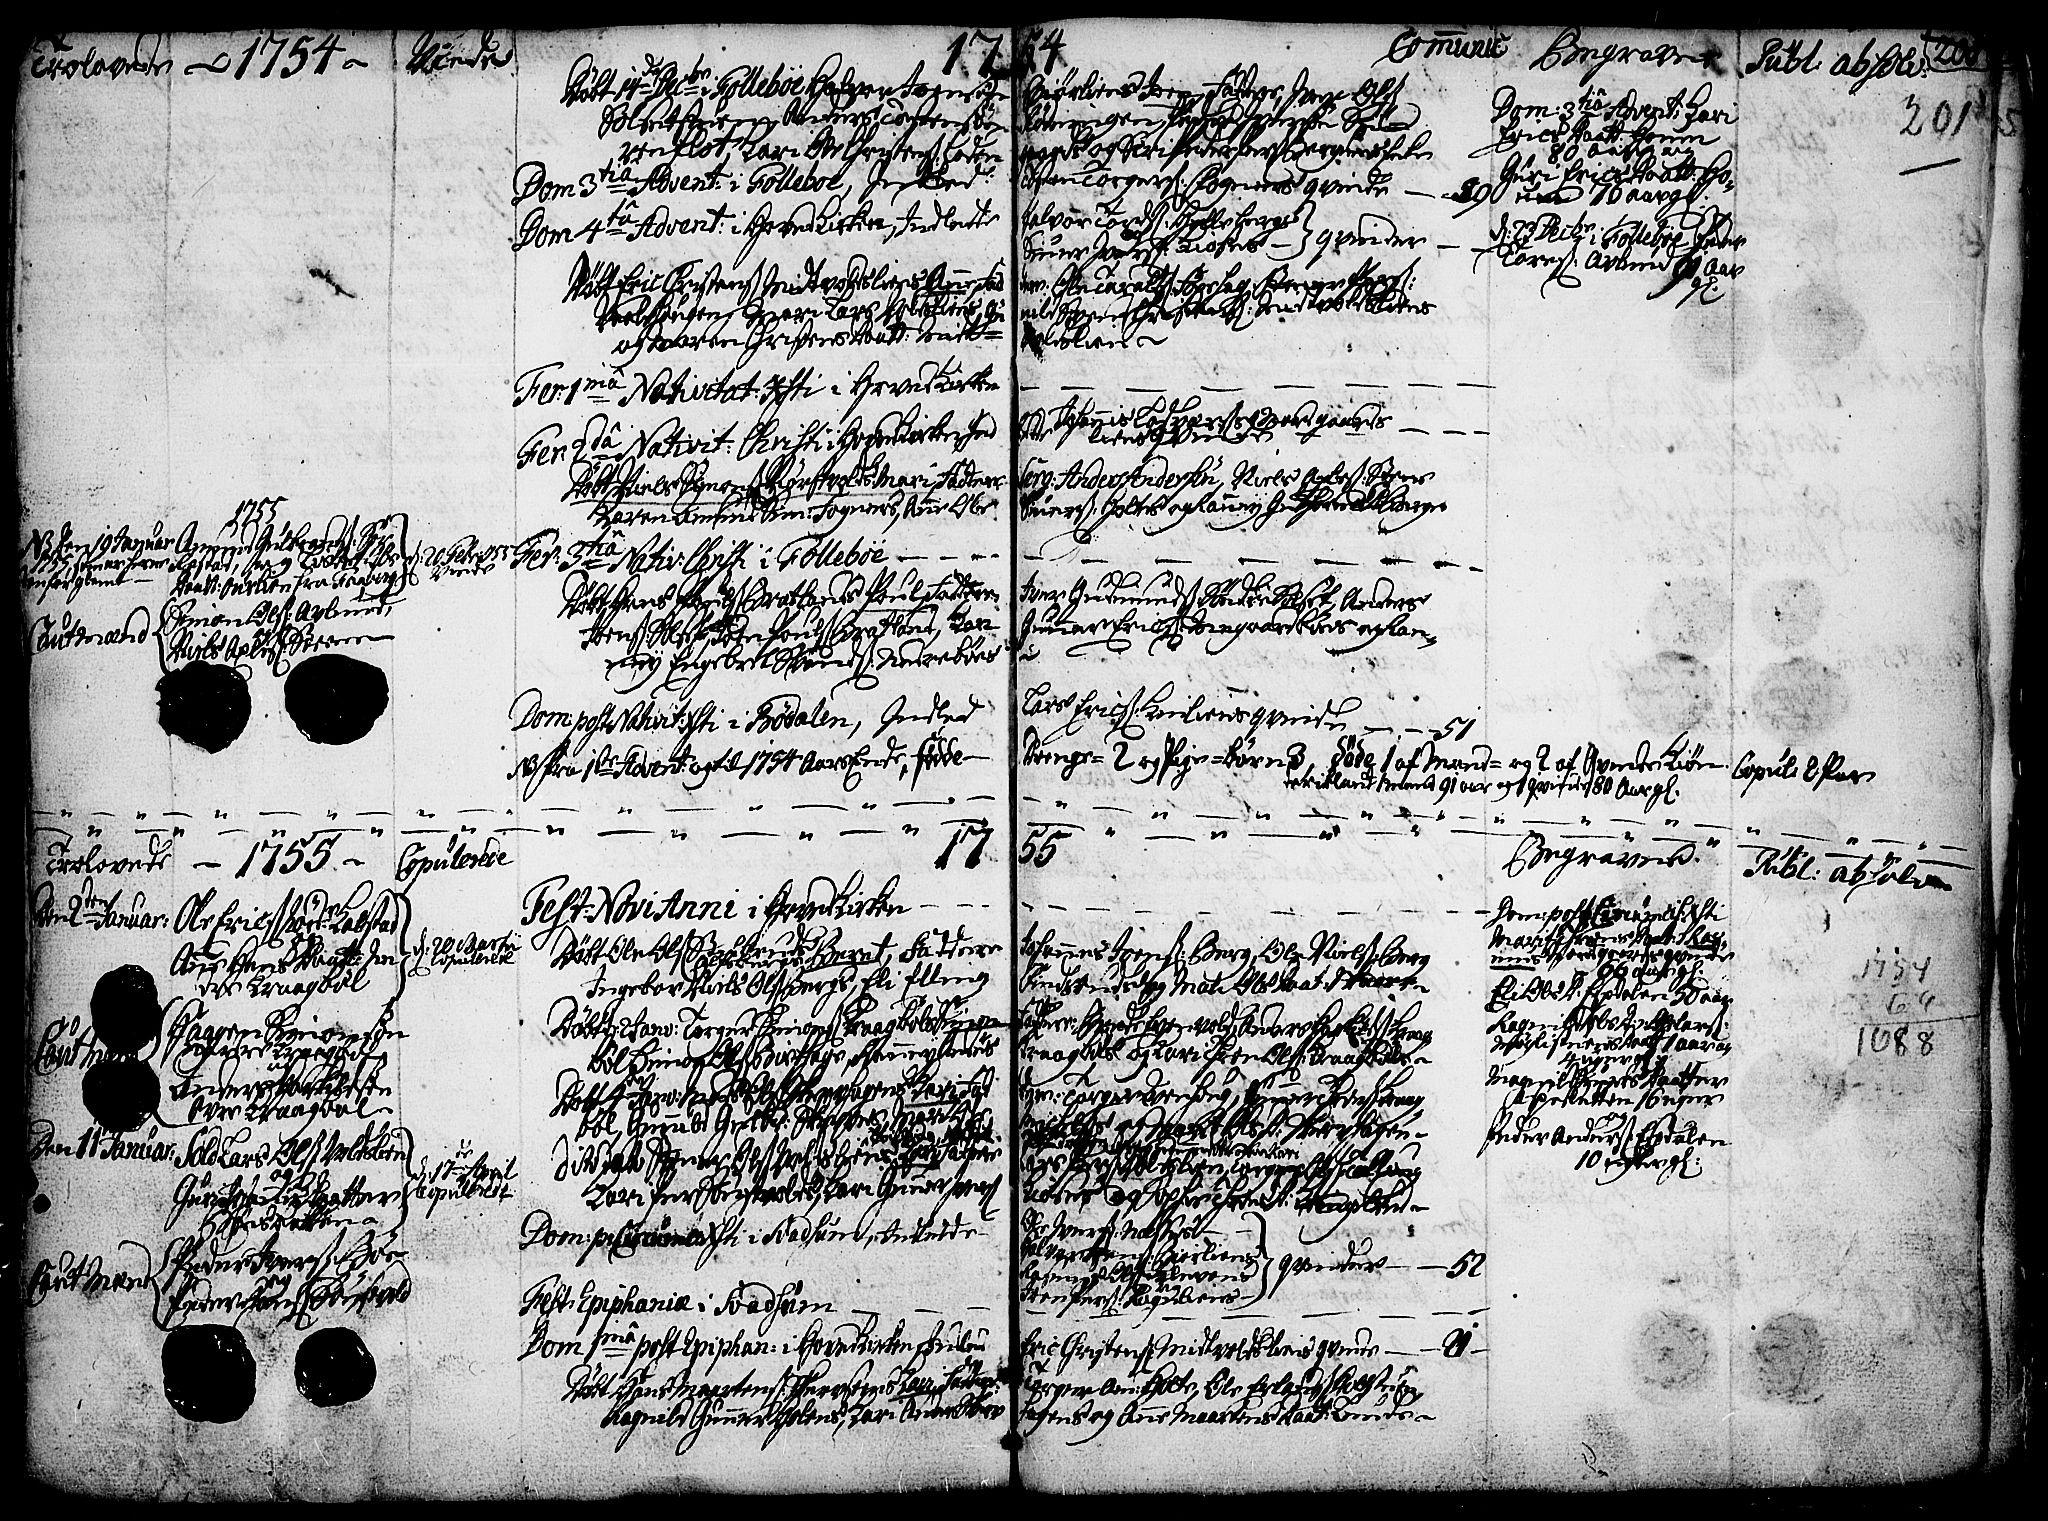 SAH, Gausdal prestekontor, Ministerialbok nr. 2, 1729-1757, s. 201